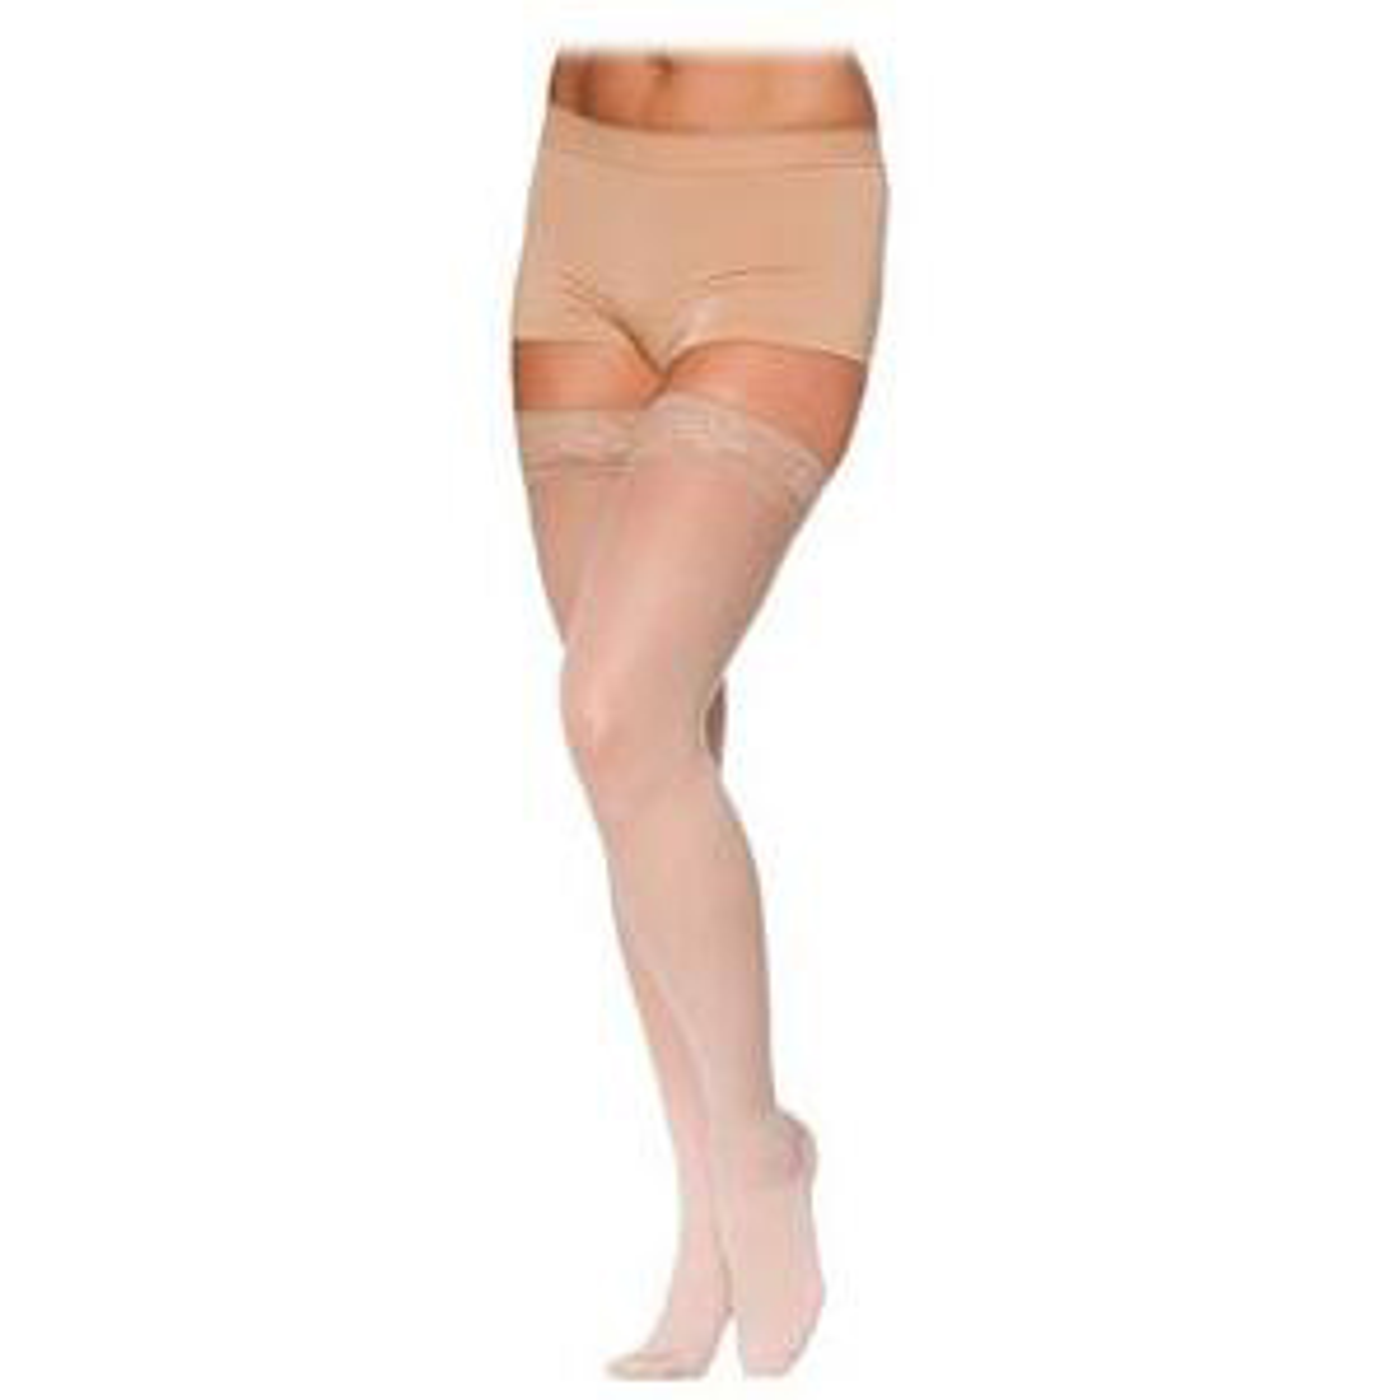 Sigvaris EverSheer Women's Thigh-High Compression Stockings w/Grip Top, Large Long 20-30 mmHg- Pair